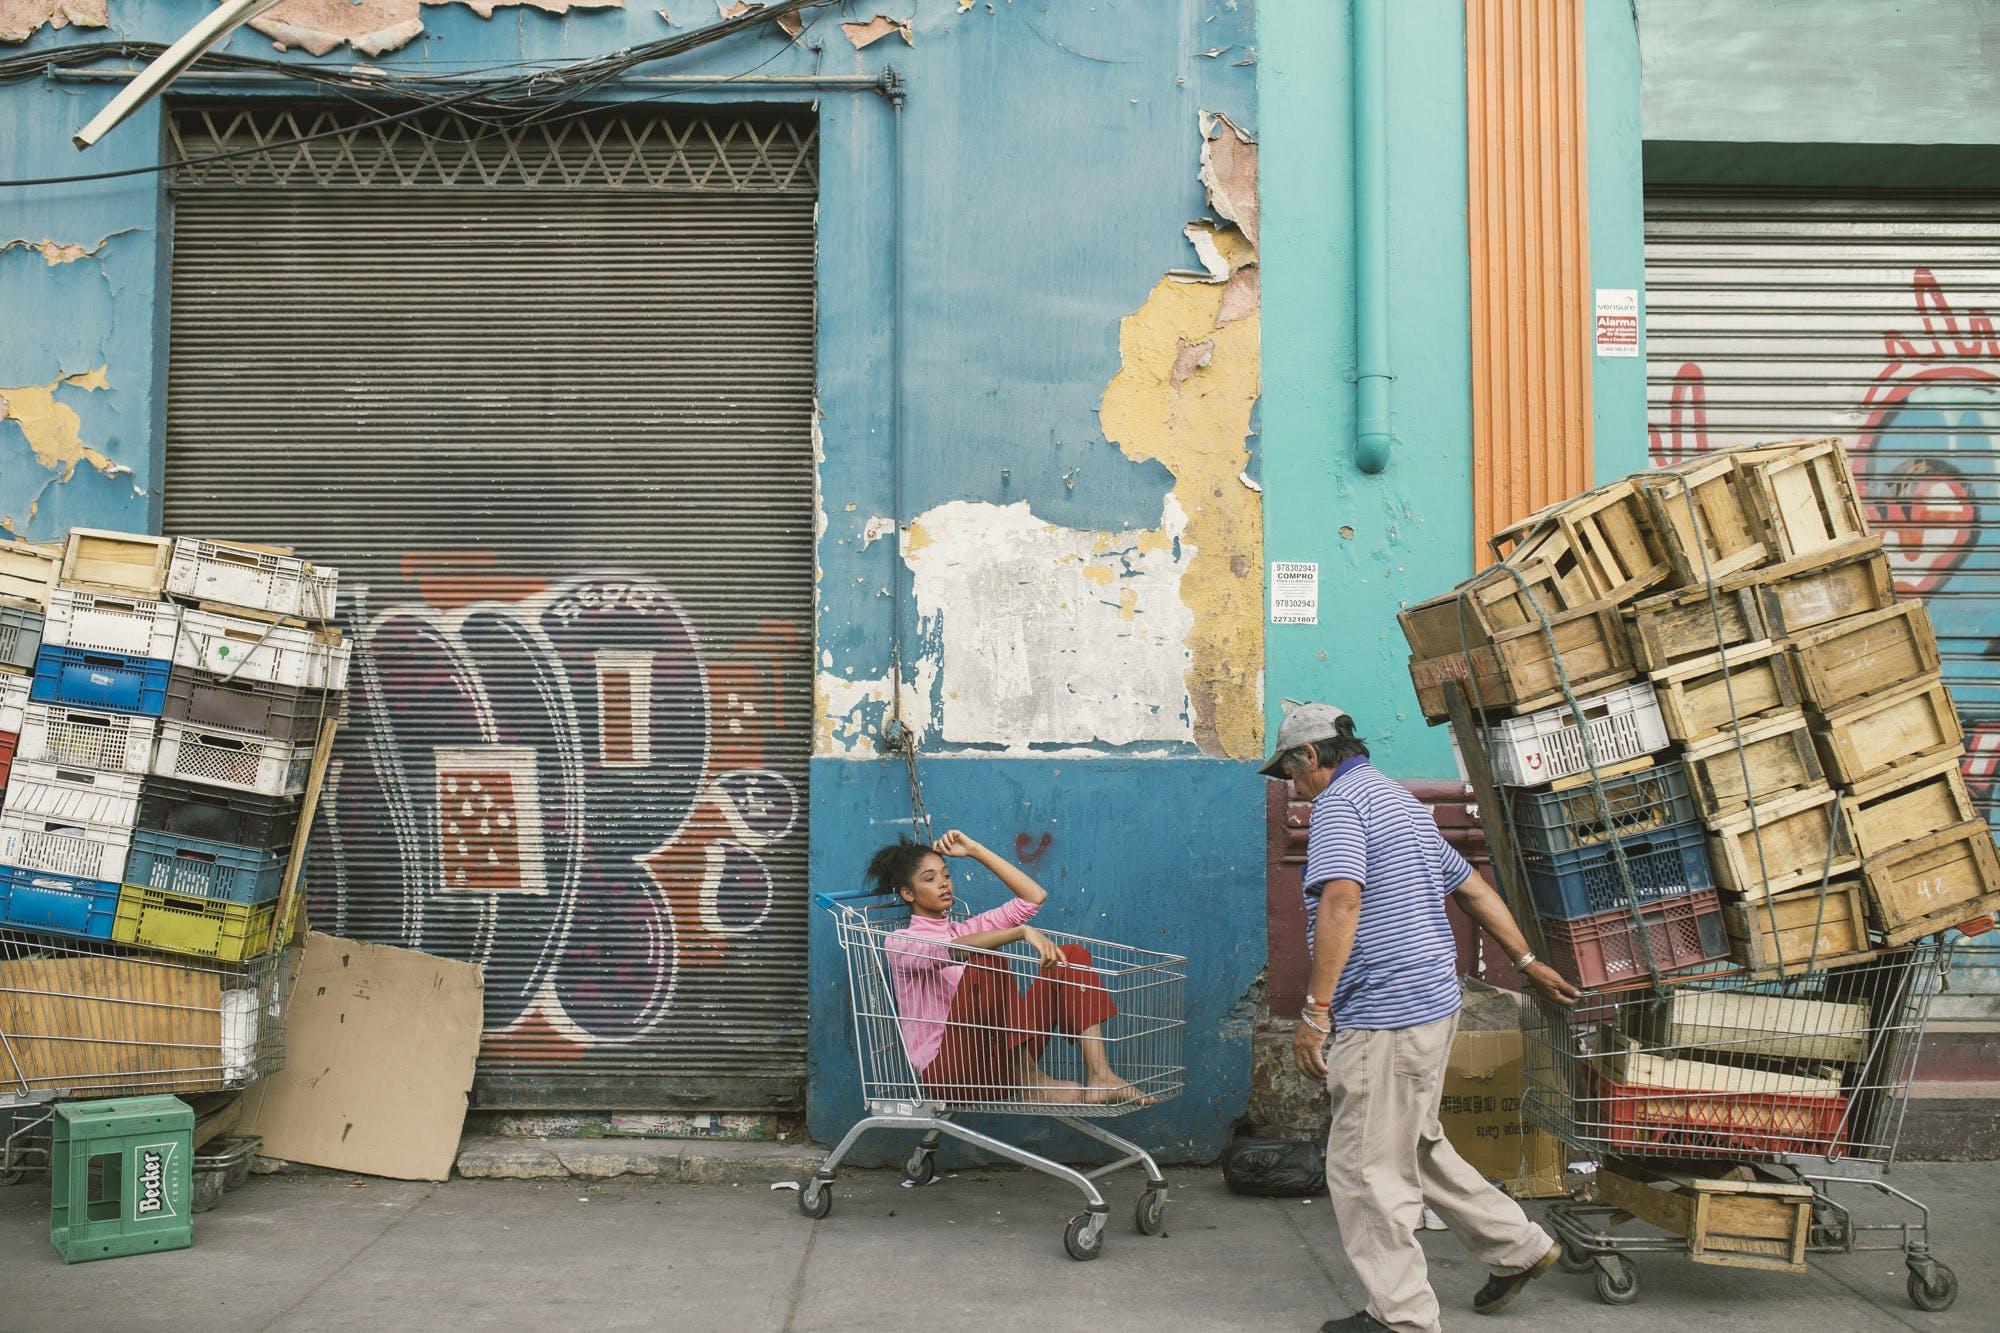 Man Wearing Gray Cap and Blue Shirt Holding Shopping Cart